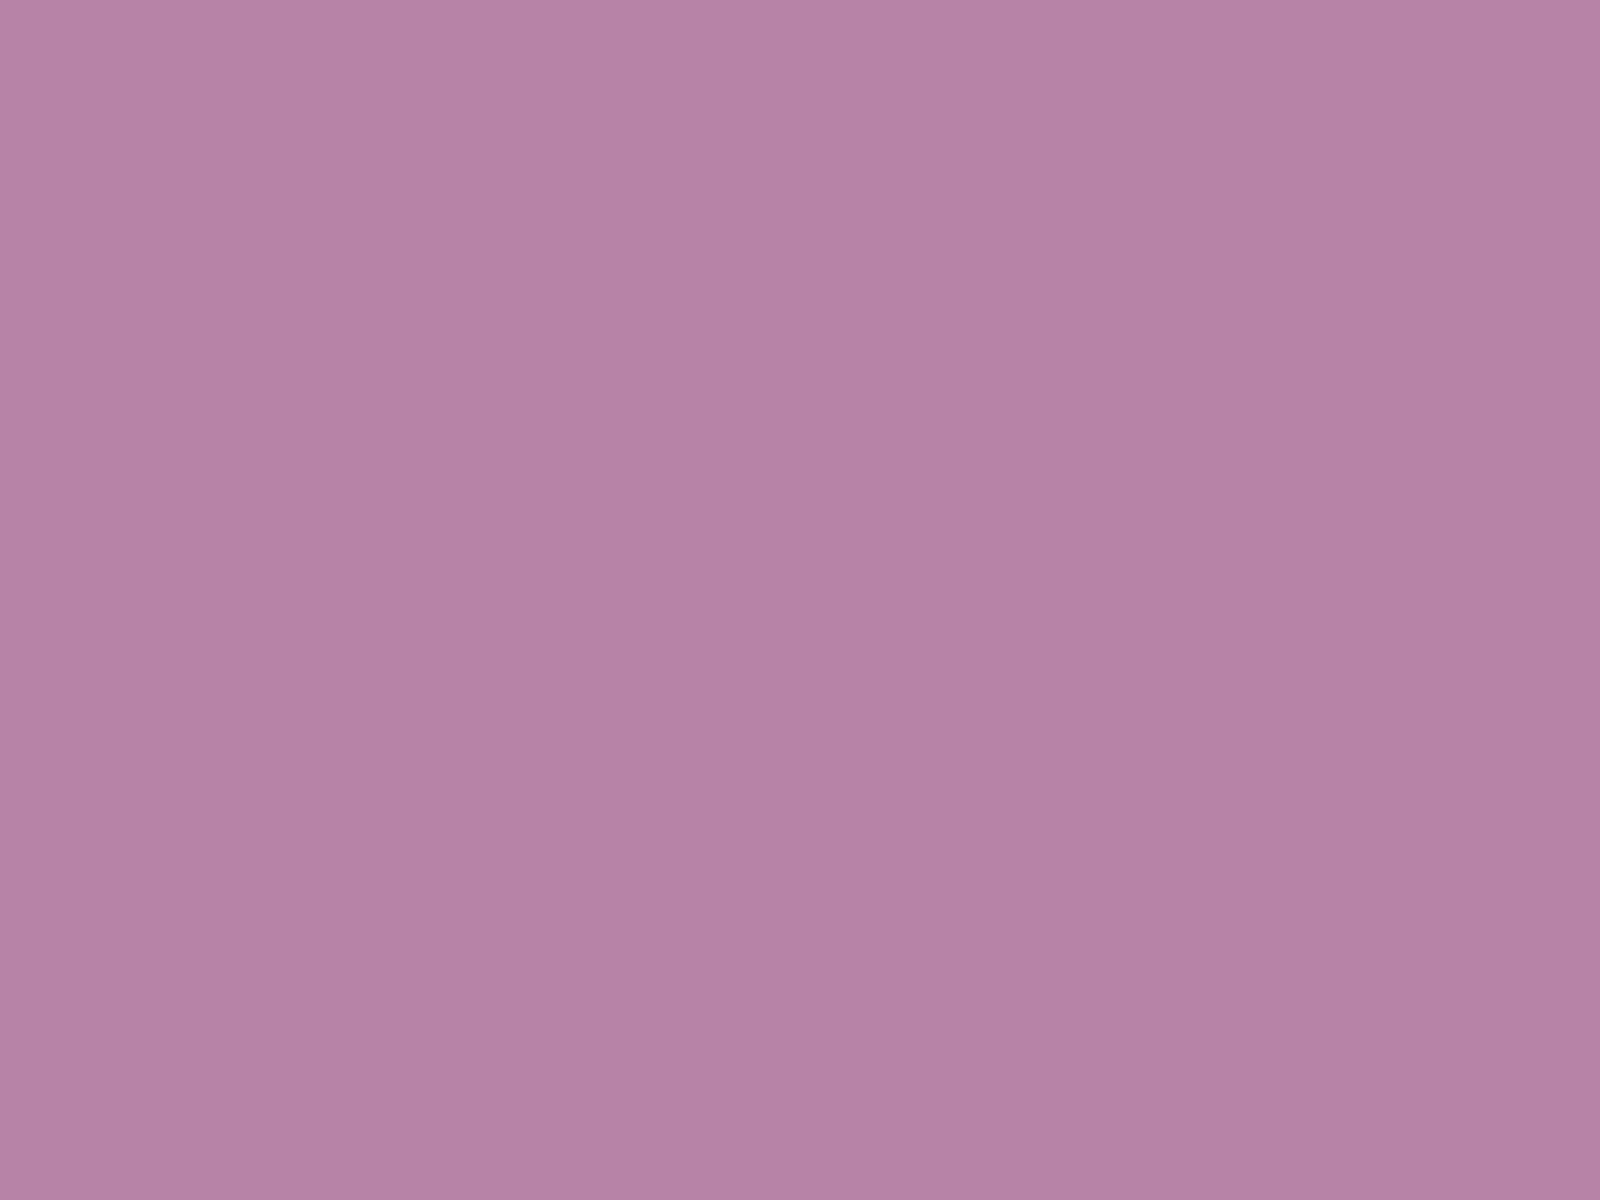 1600x1200 Opera Mauve Solid Color Background